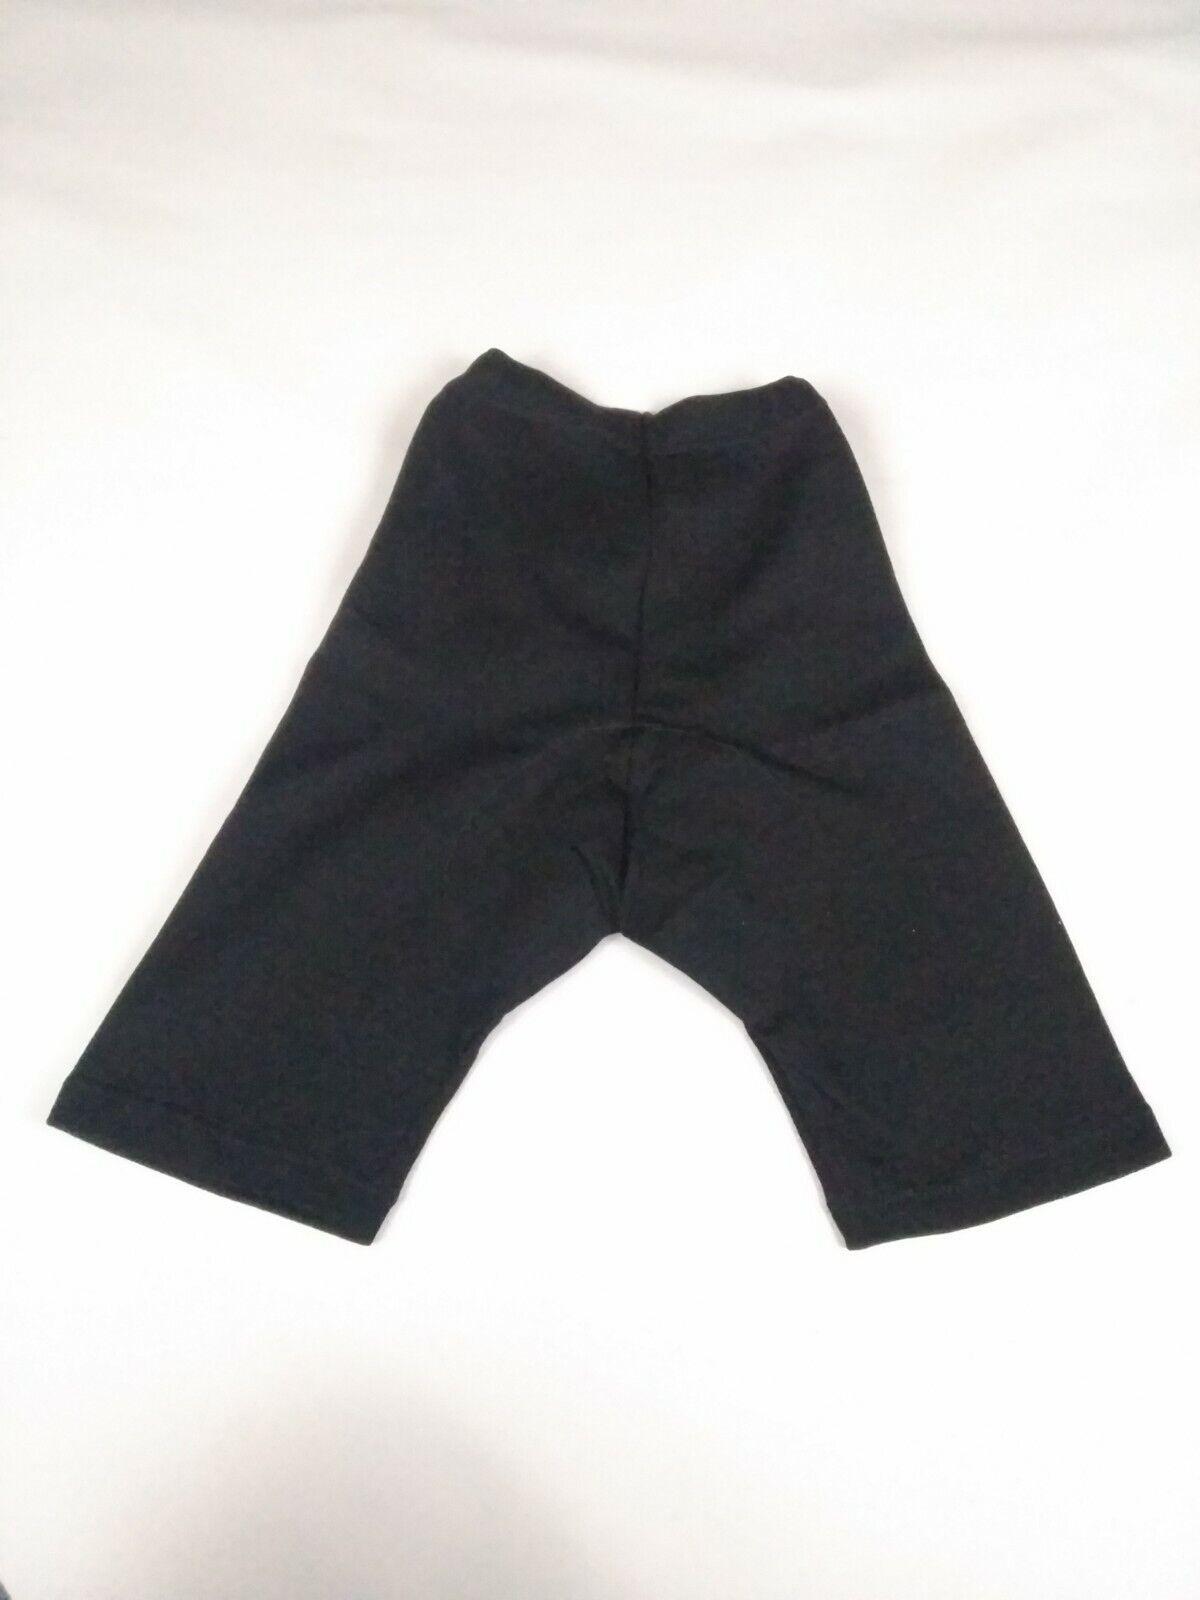 Vintage Nos lana wool ciclismo Cycling  pants pantaloncini pantaloncini pantaloncini salopette 4 L 70s d7b